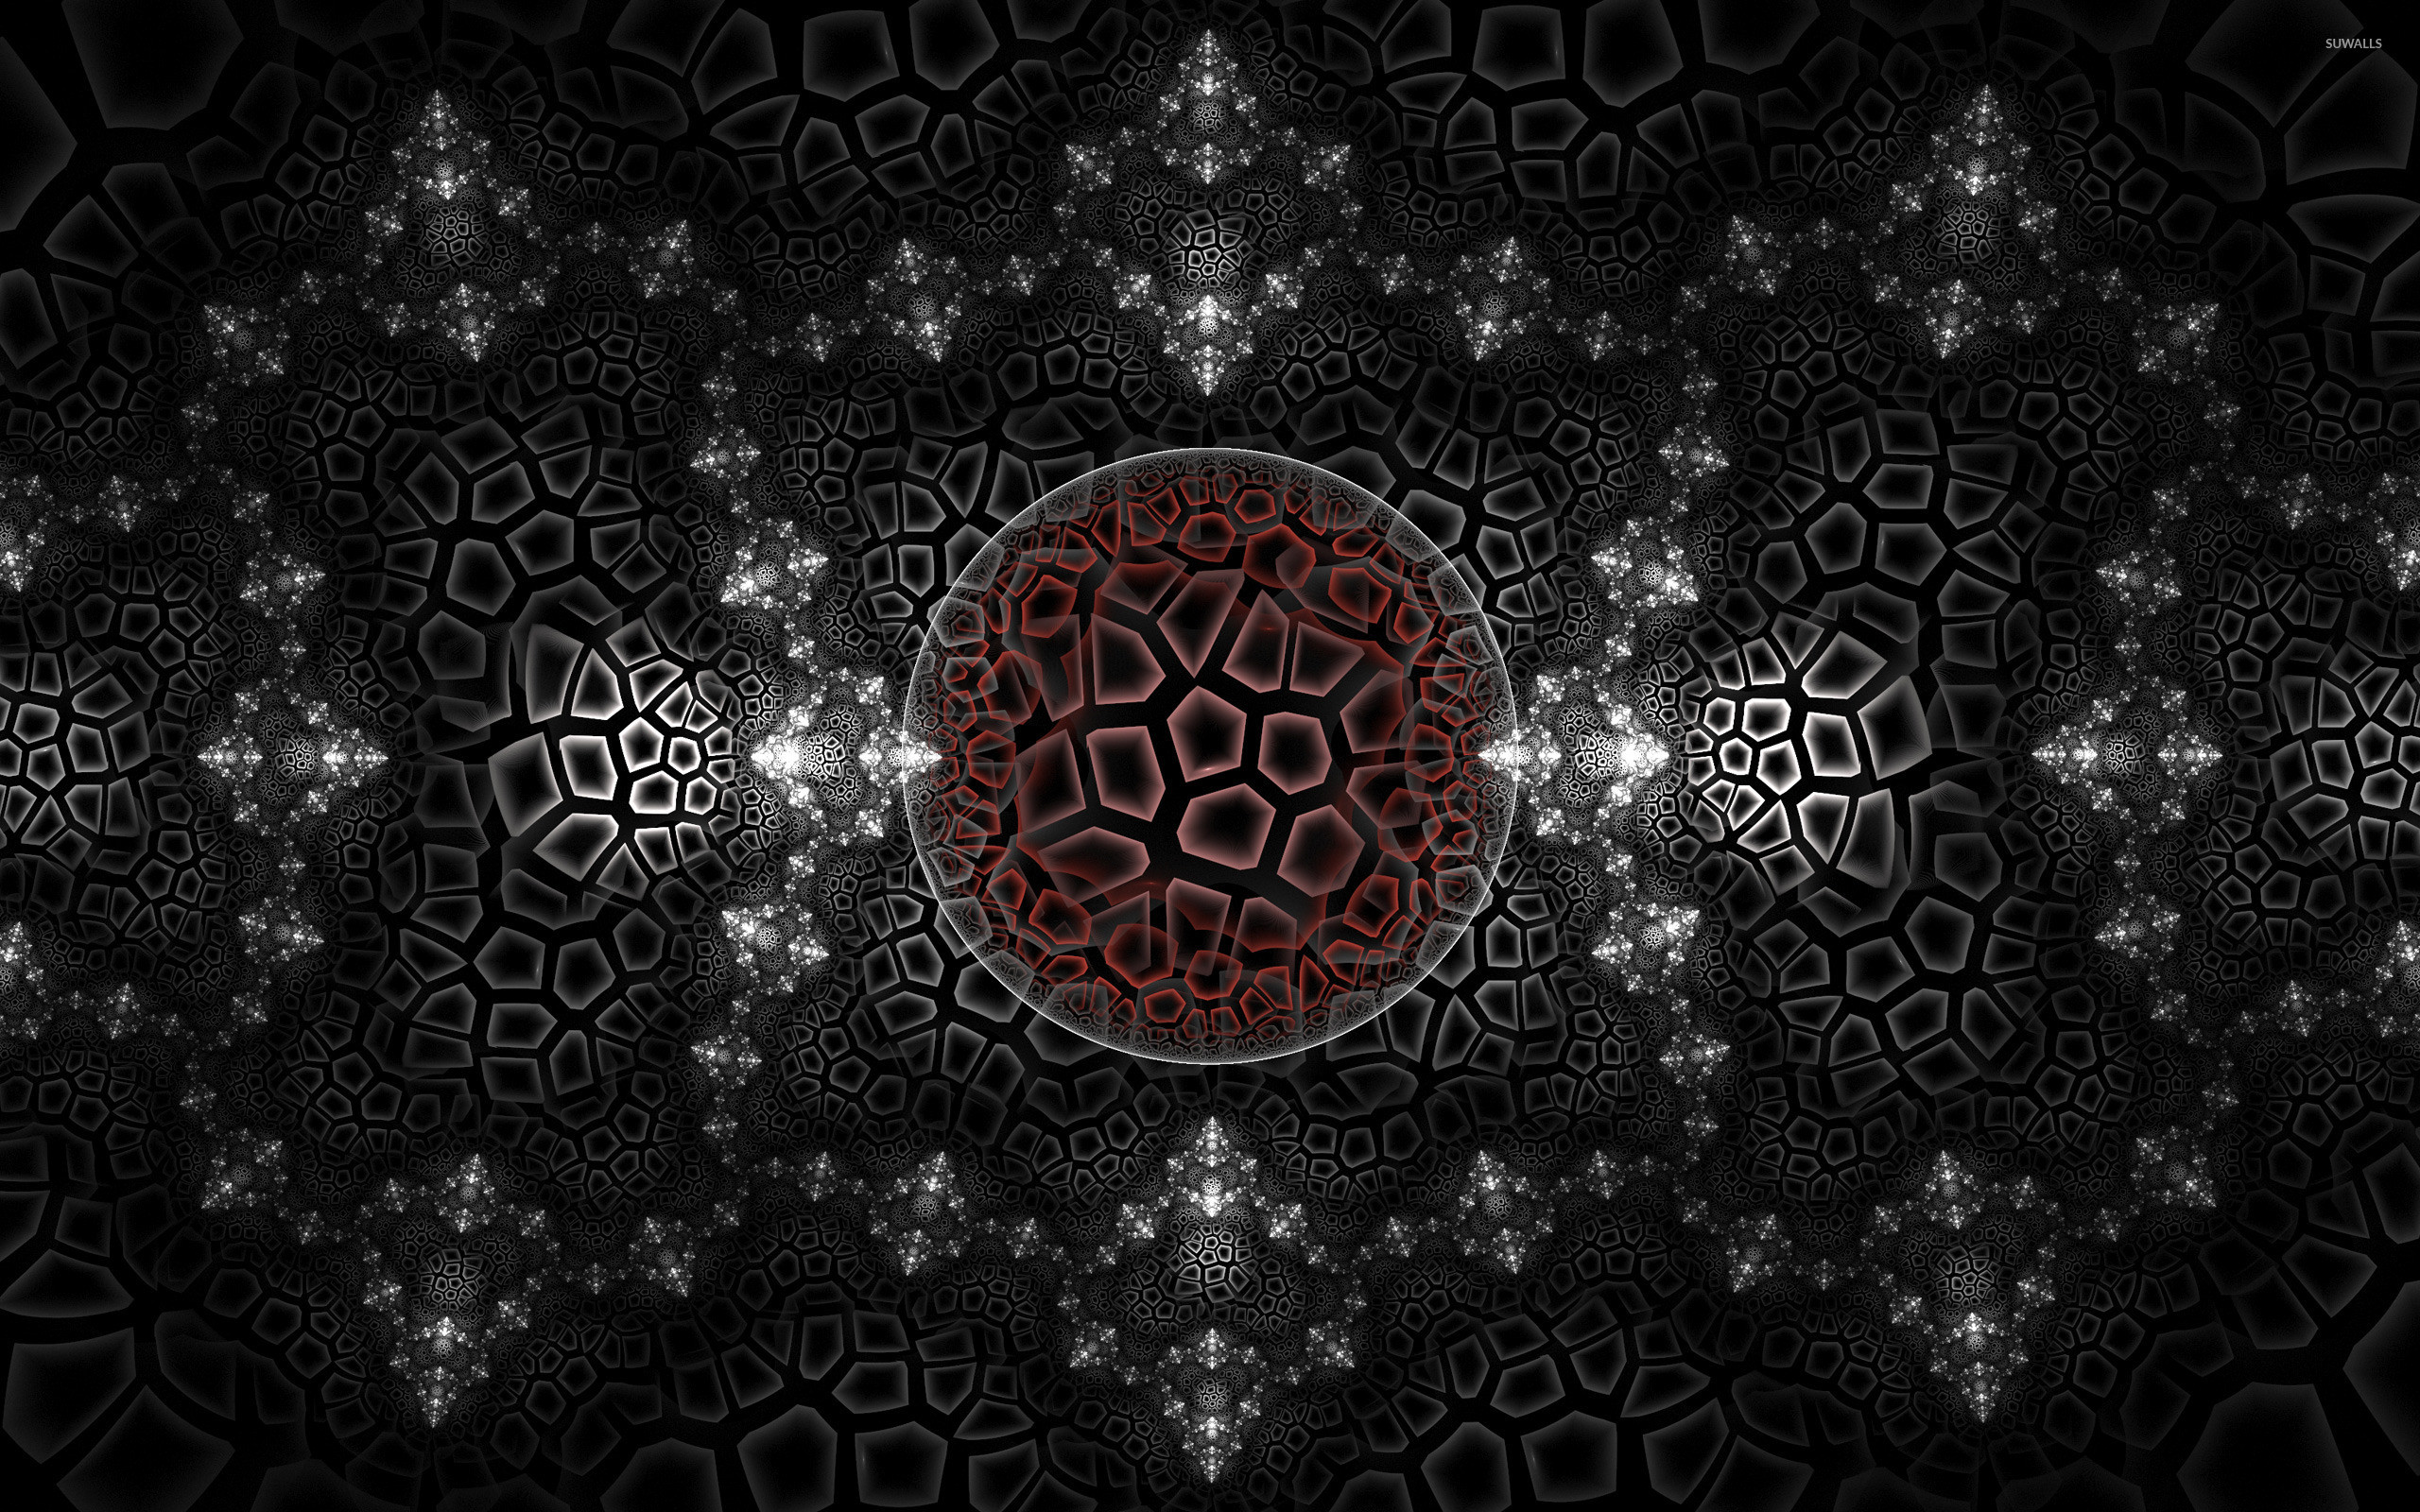 Polygons wallpaper